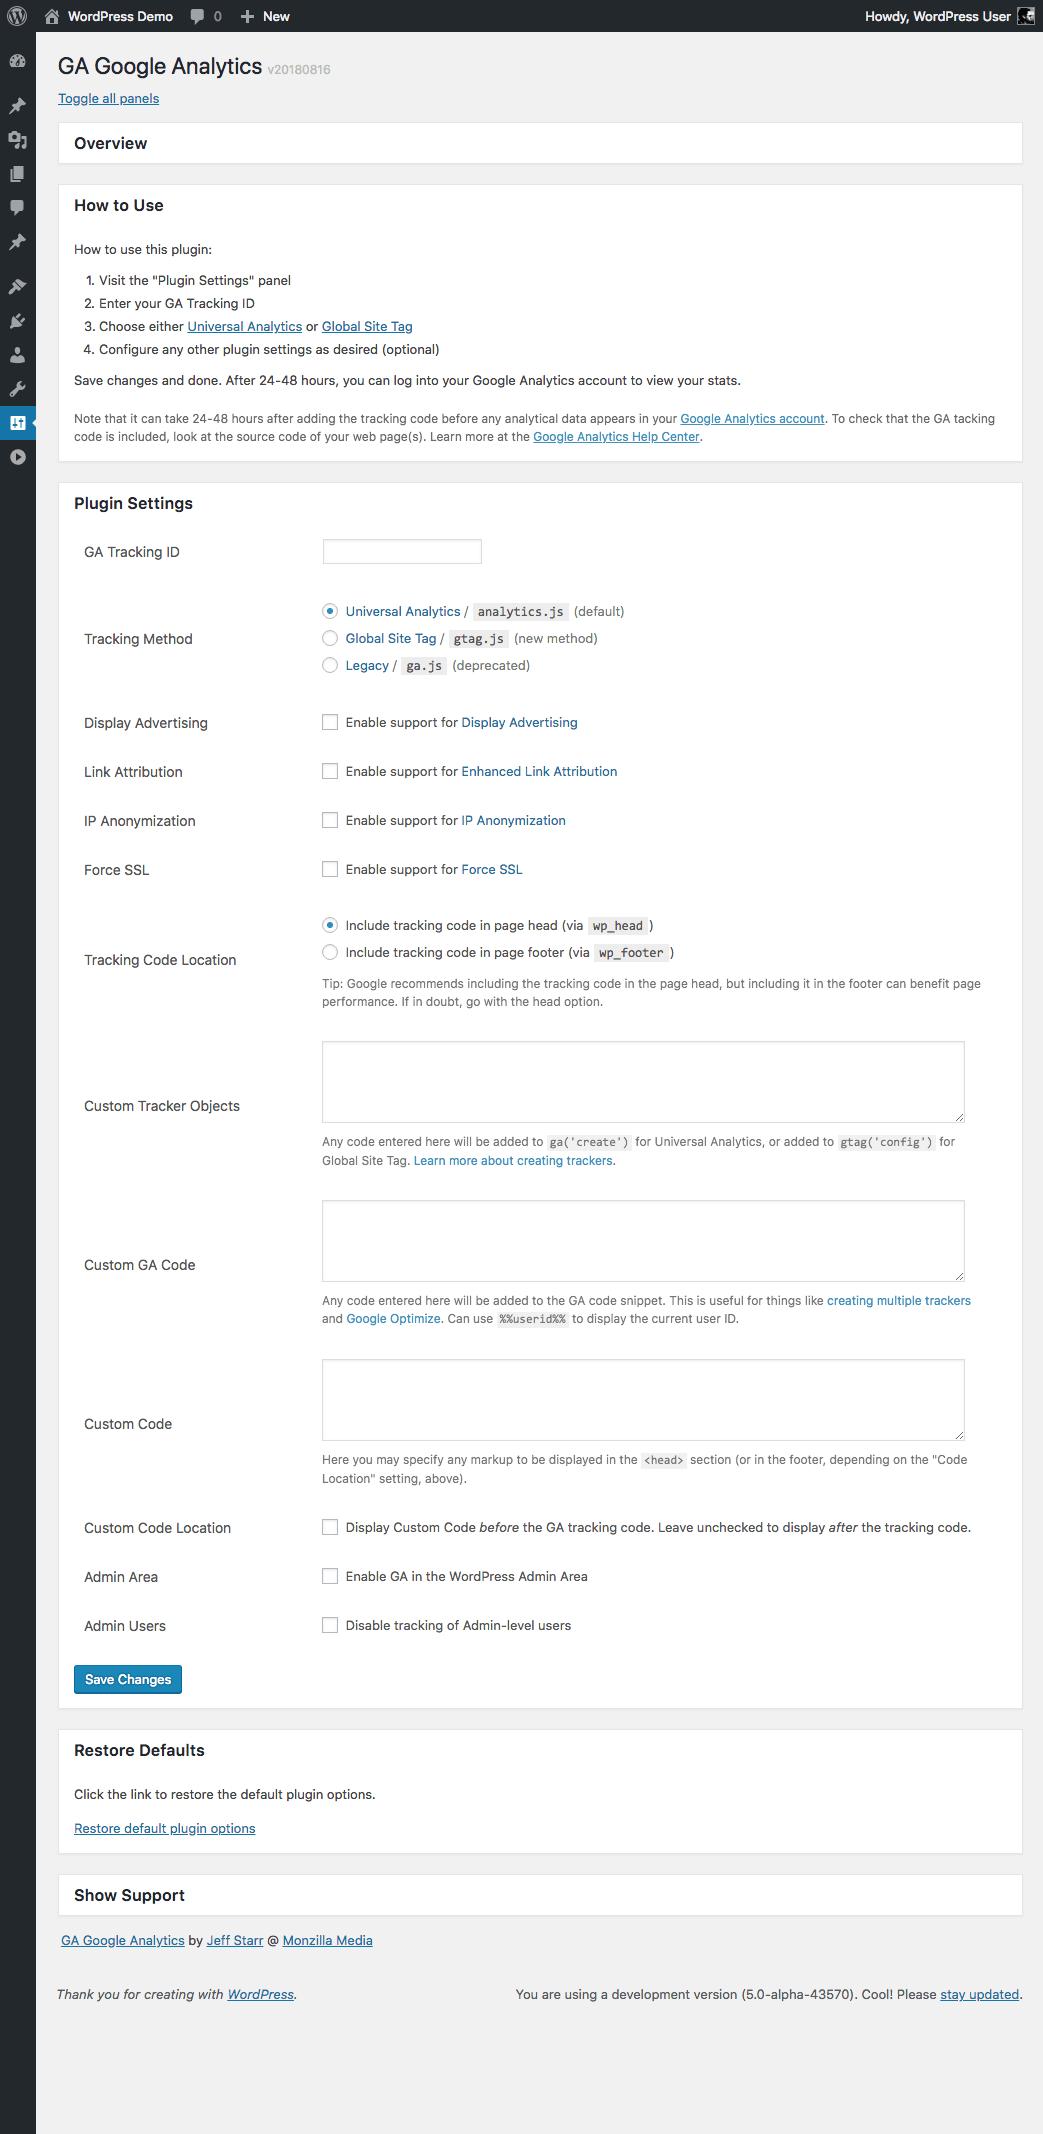 GA Google Analytics: Plugin Settings (expanded)